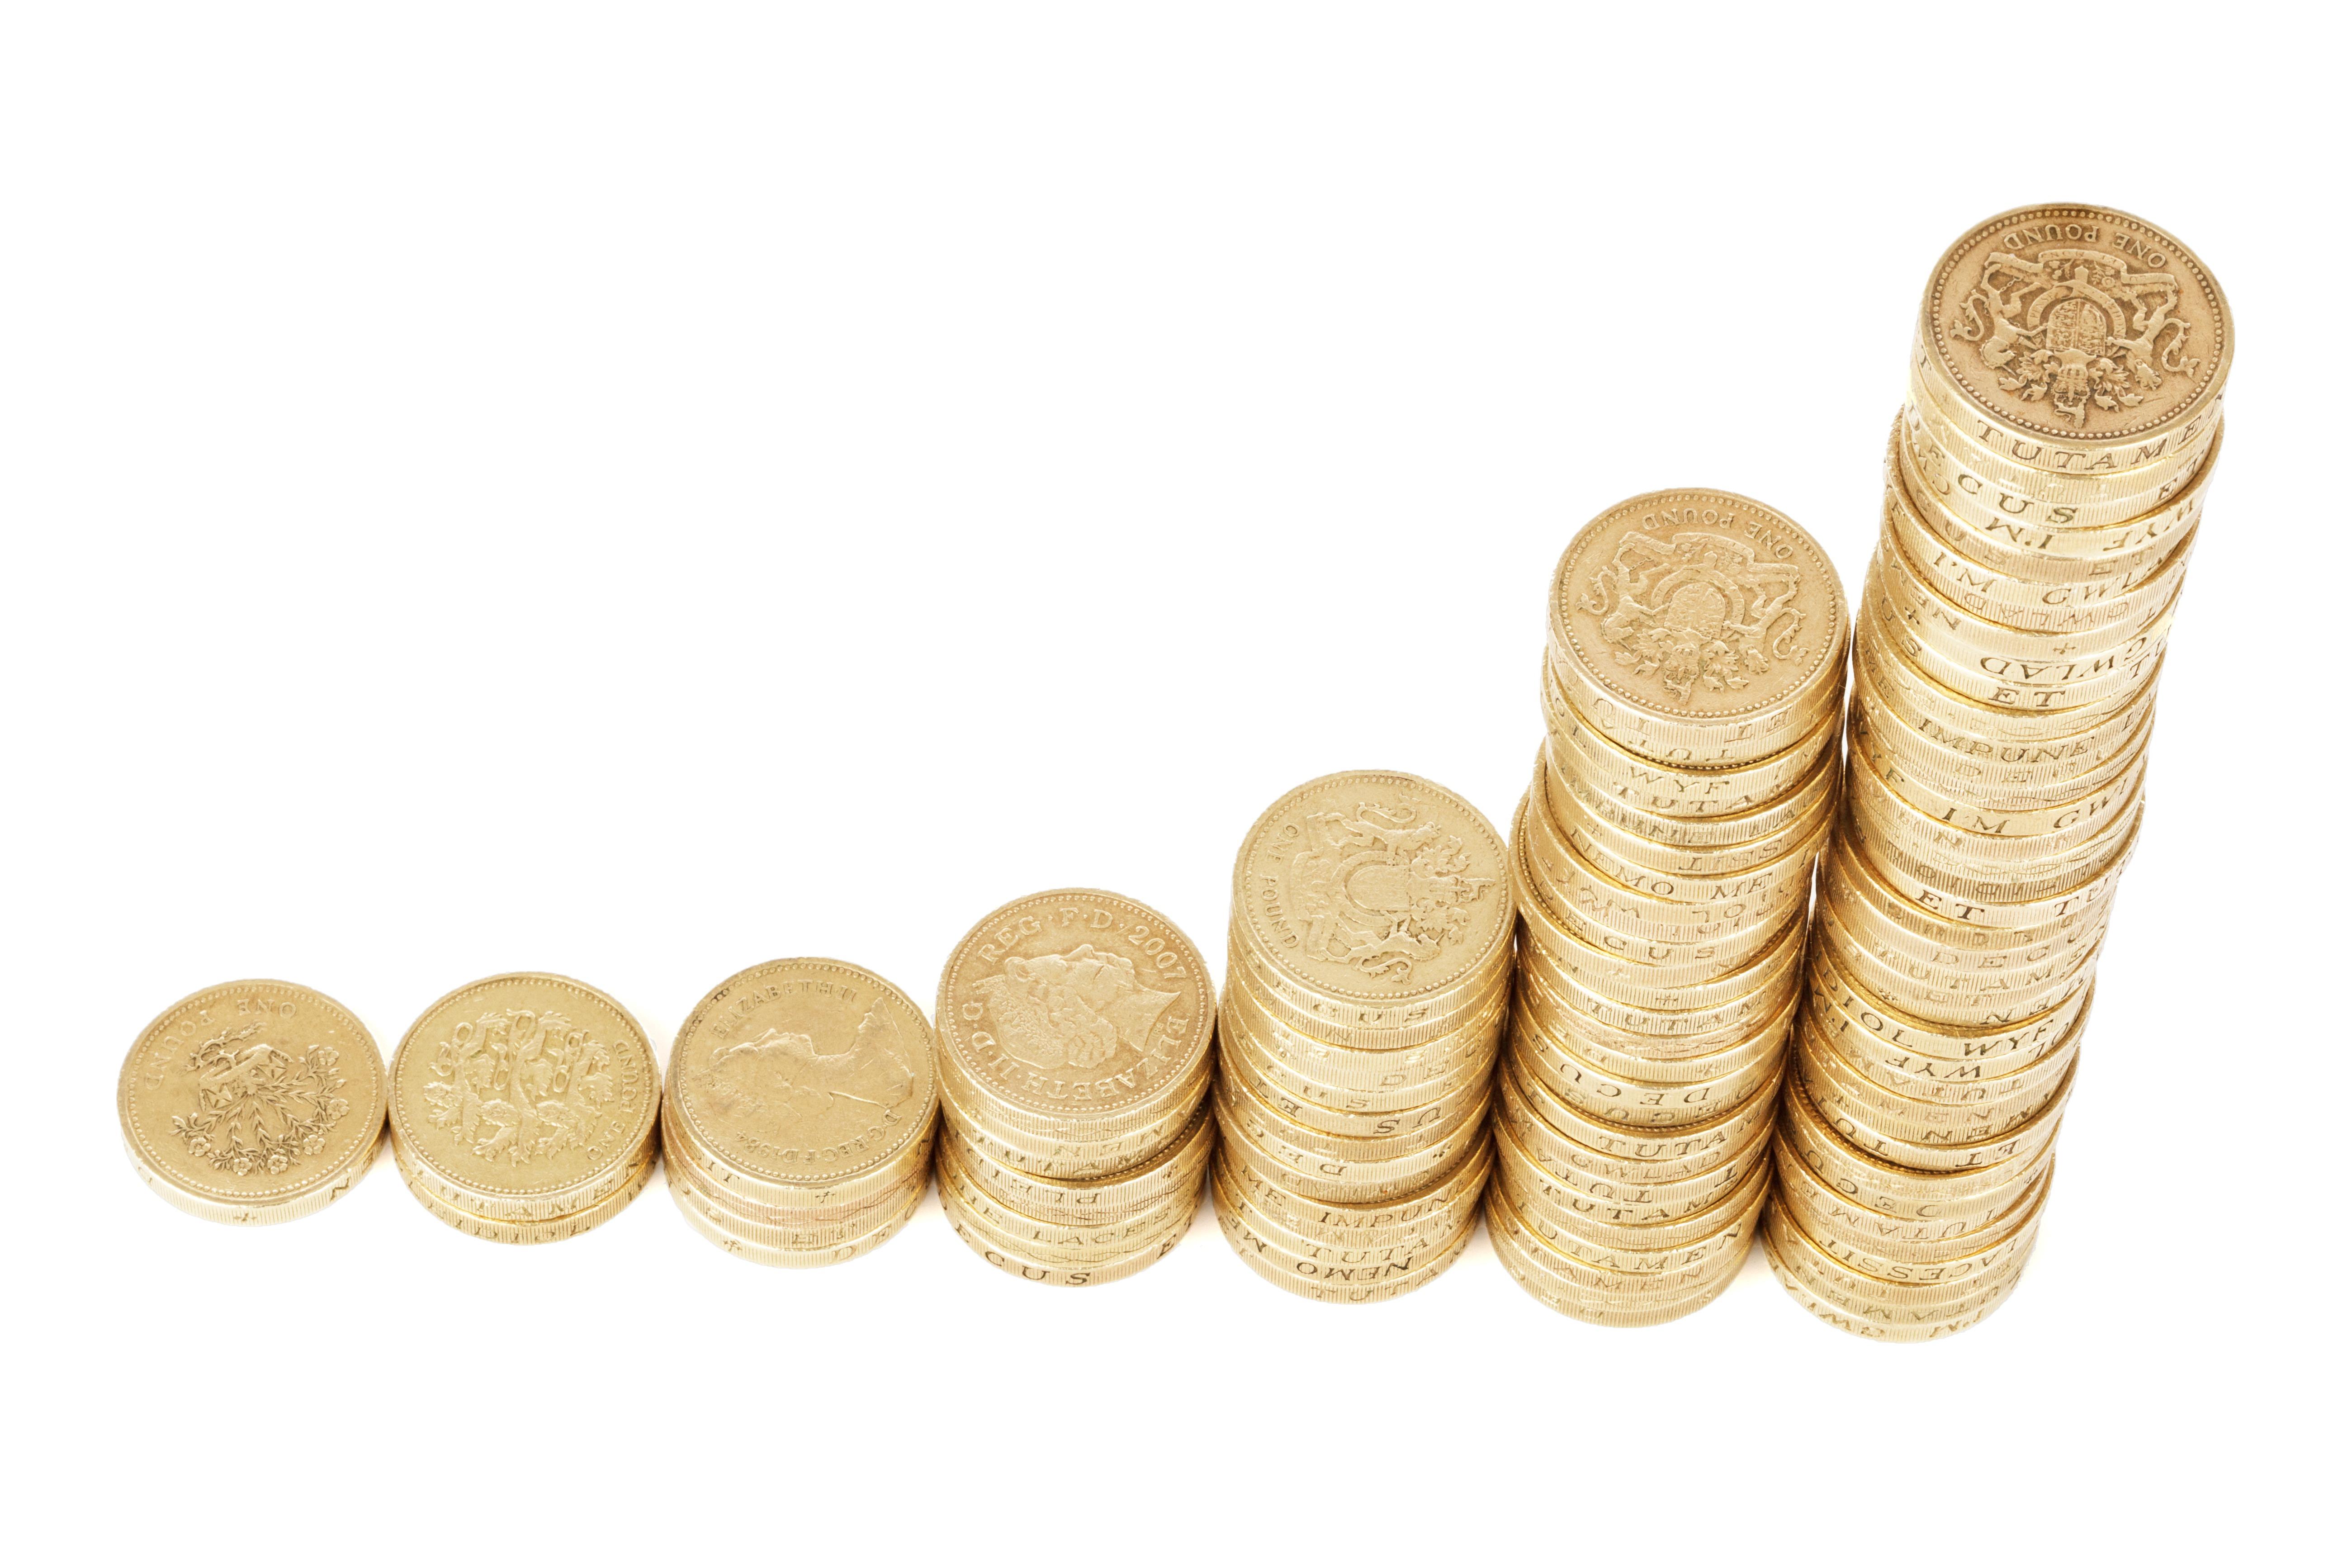 money-coins-stack-wealth-50545